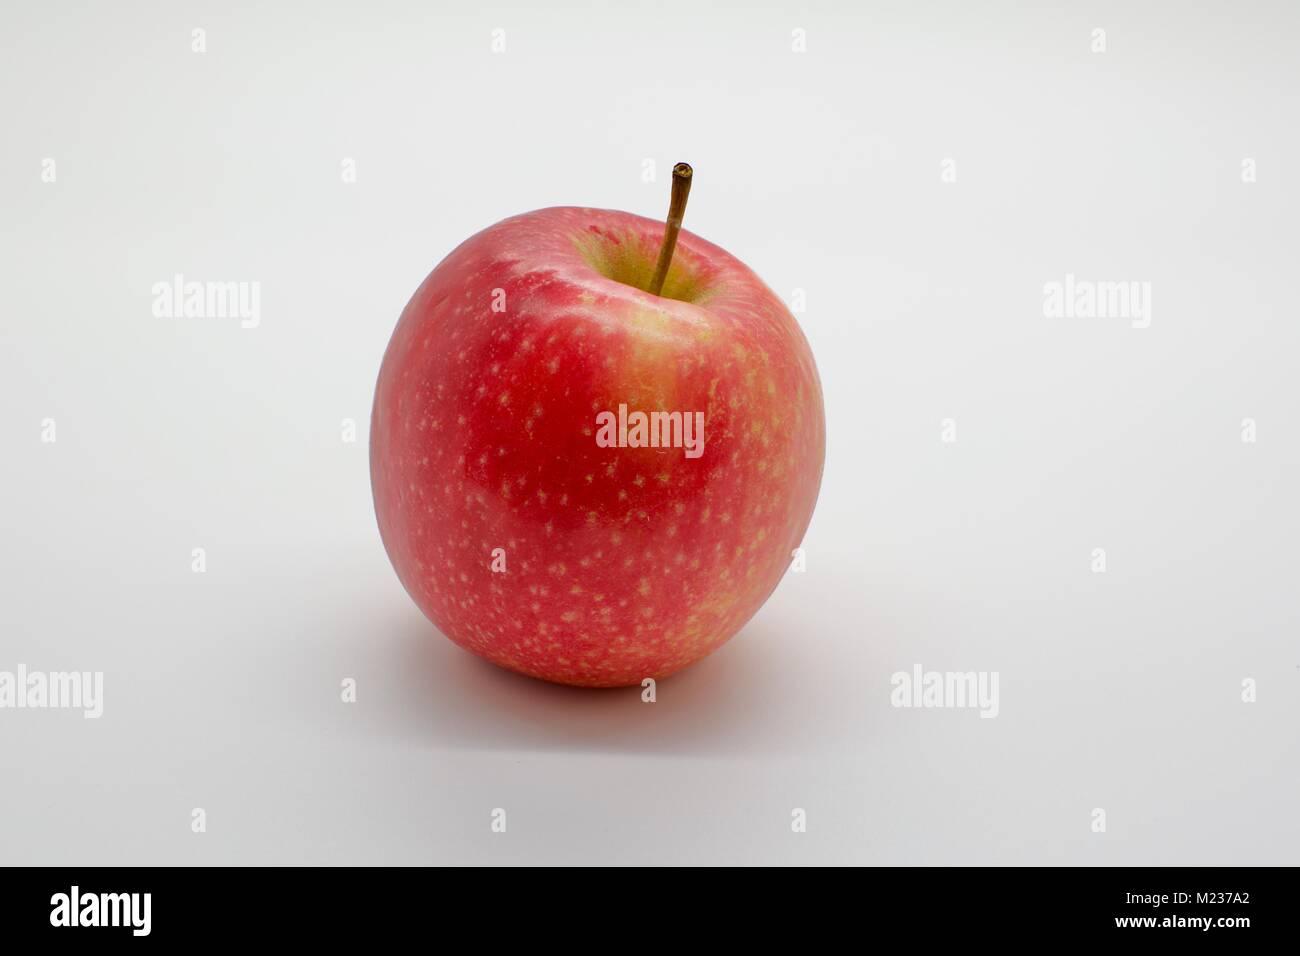 A single Jazz variety apple on a white background - Stock Image